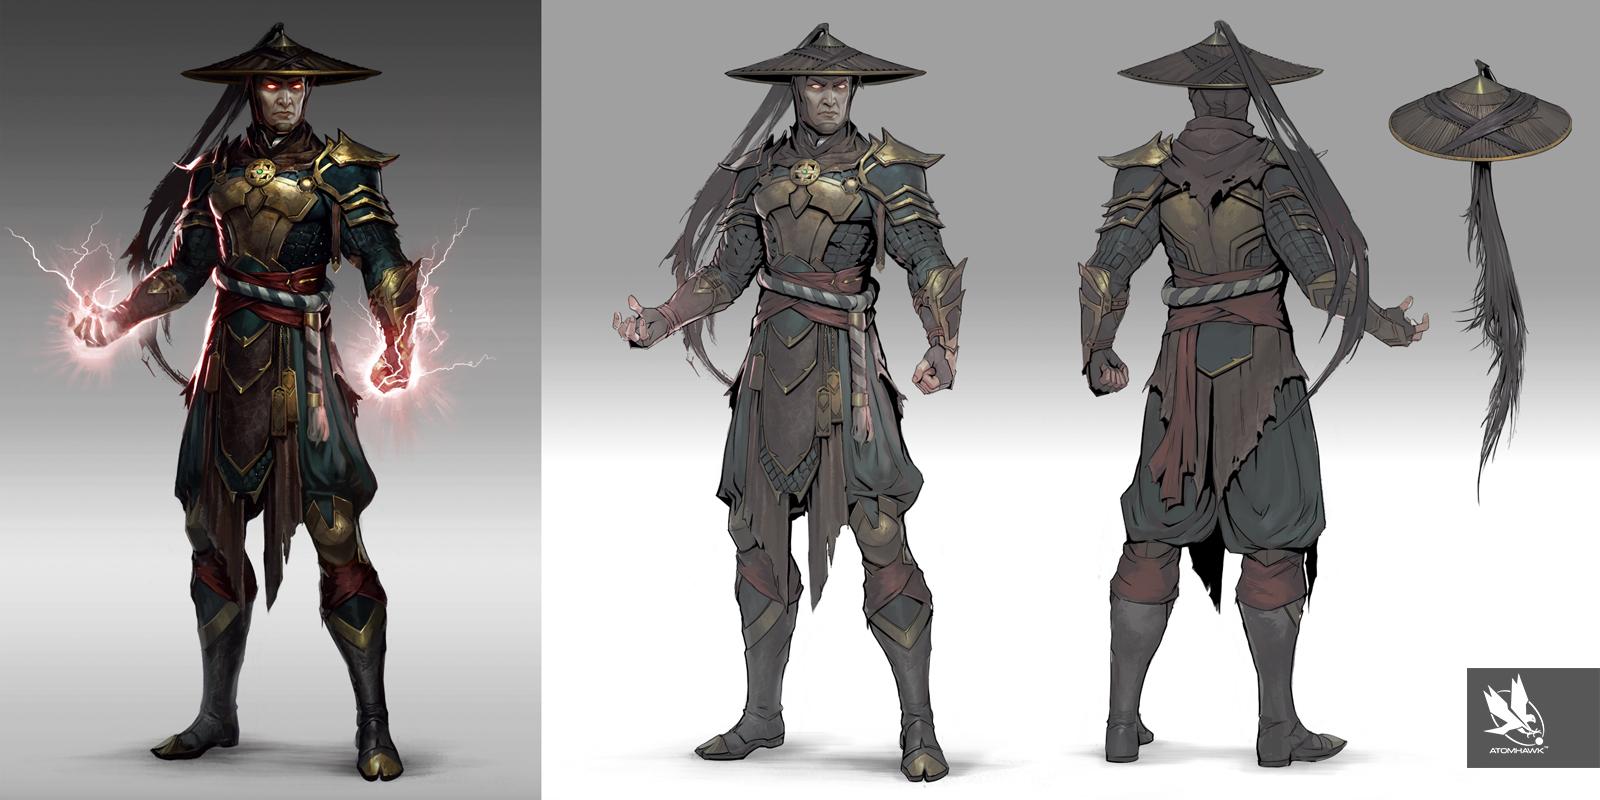 Atomhawk_Warner-Bros-NetherRealm_Mortal-Kombat-11_Concept-Art_Character-Design_Raiden_Revenant_1.jpg